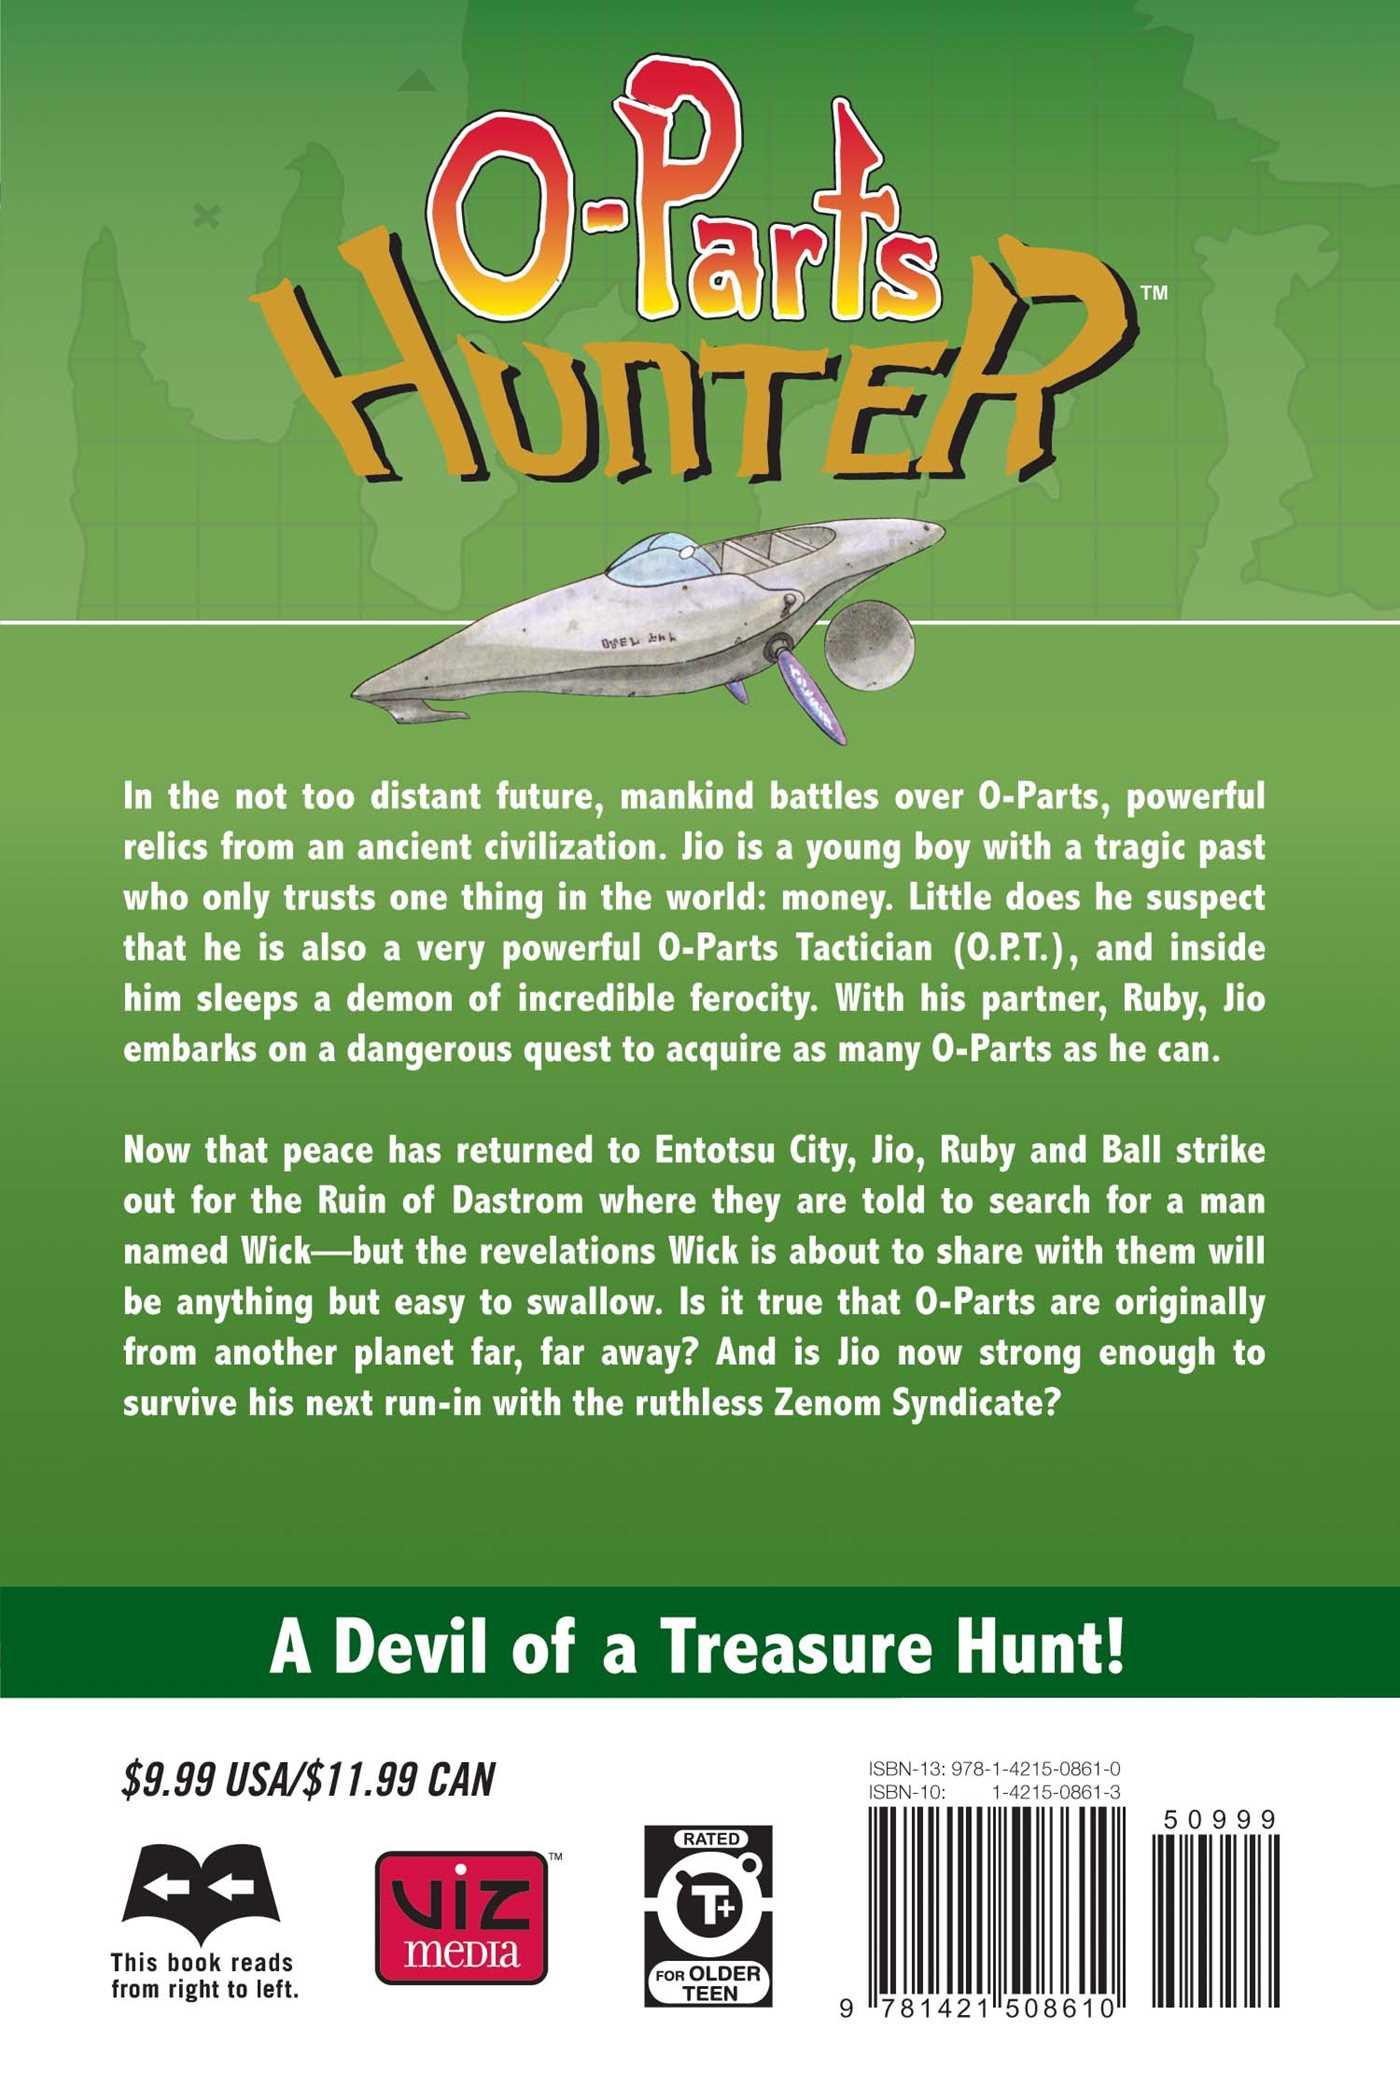 O parts hunter vol 7 9781421508610 hr back